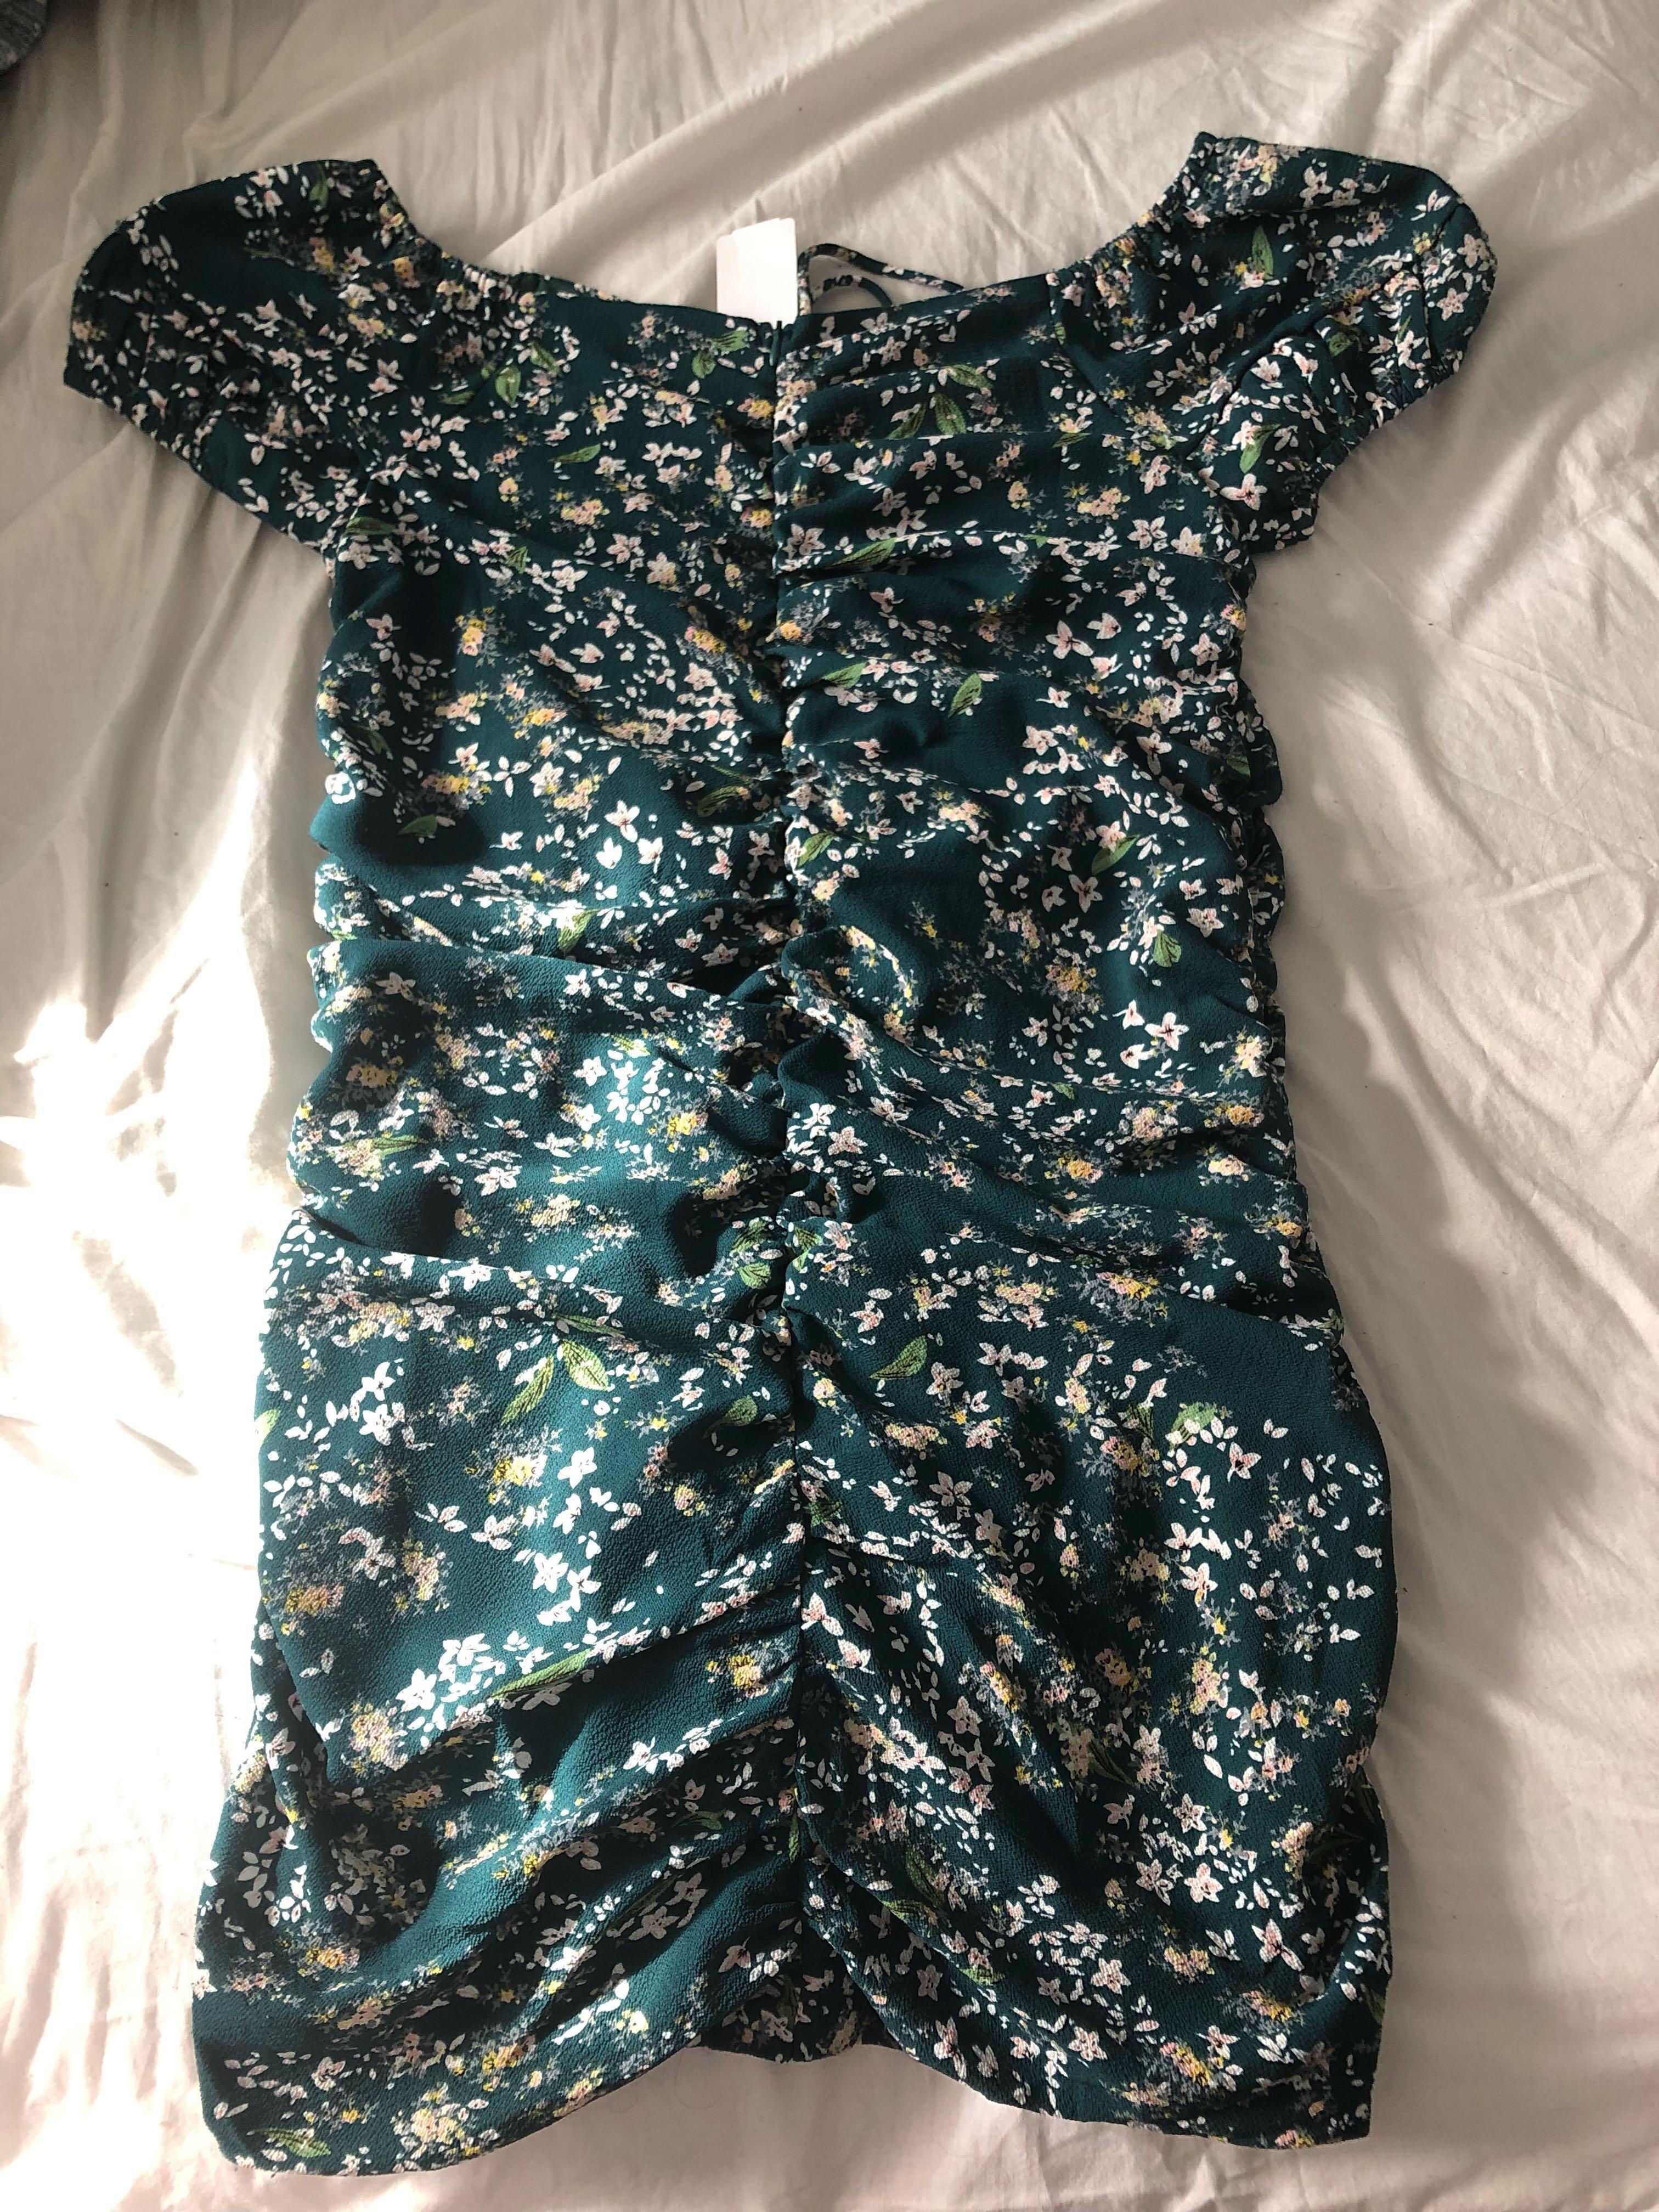 M Boutique Off the Shoulder Green Floral Ruched Dress